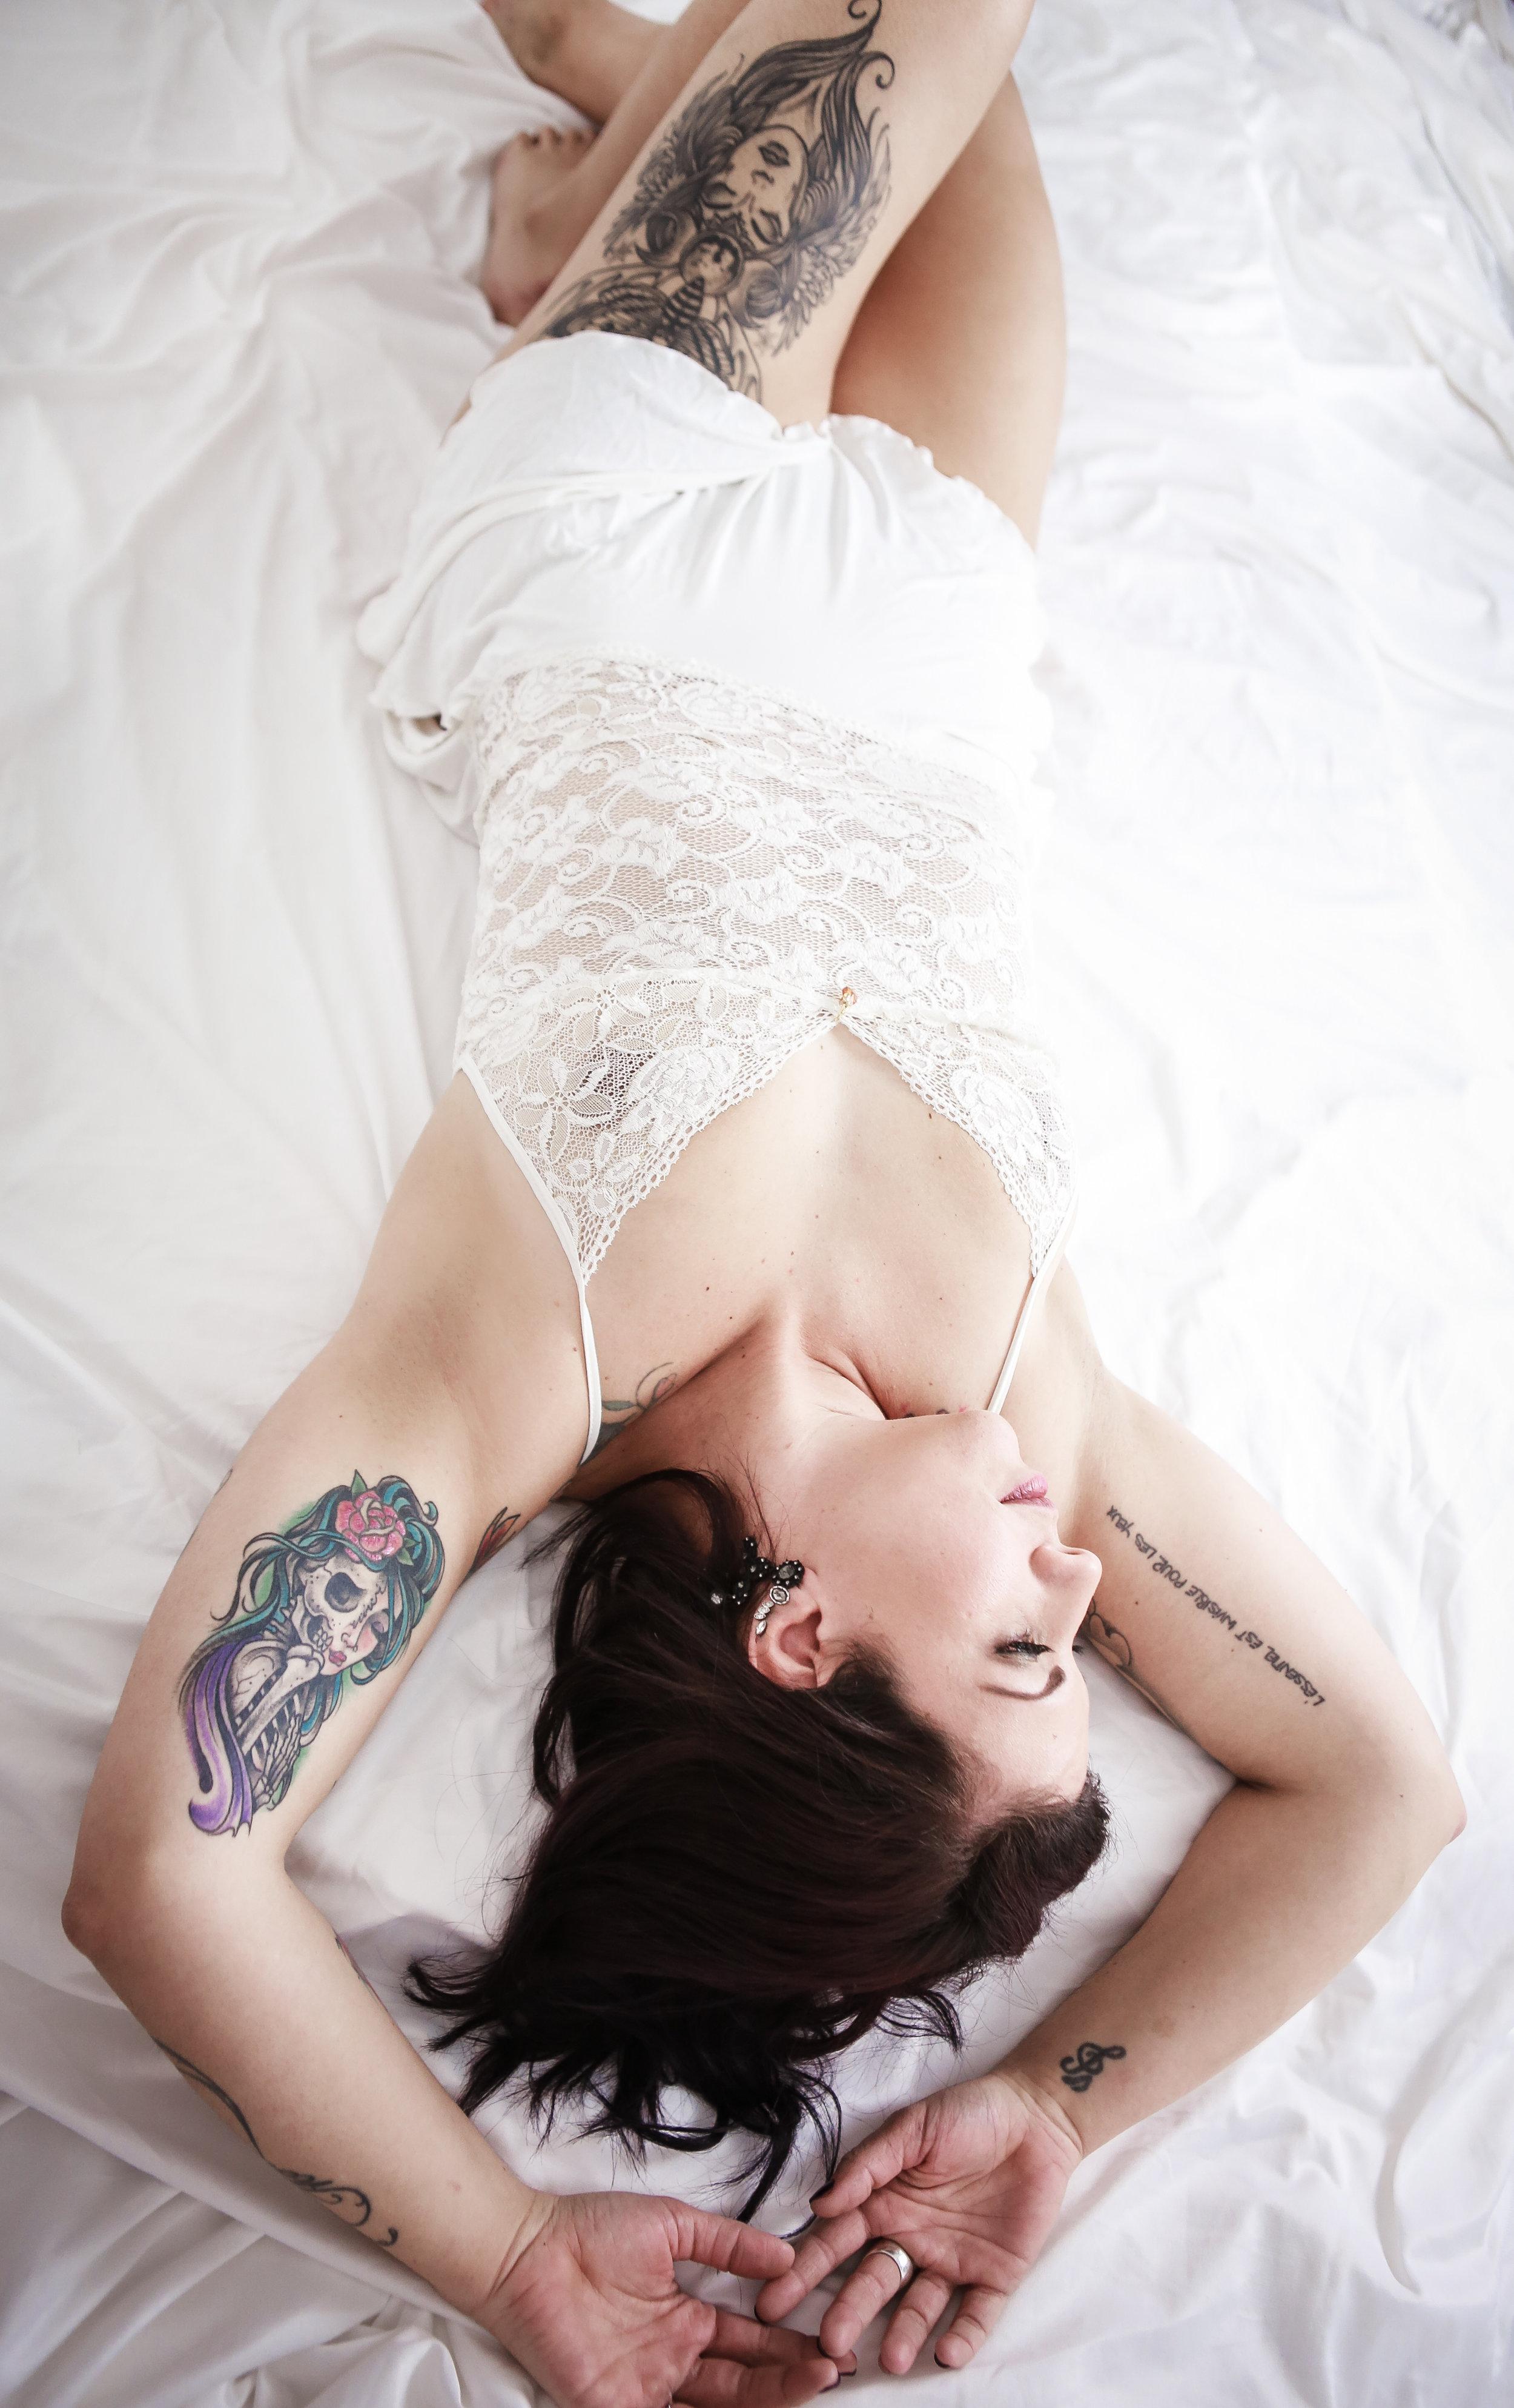 Ana sexy (17 of 20).jpg